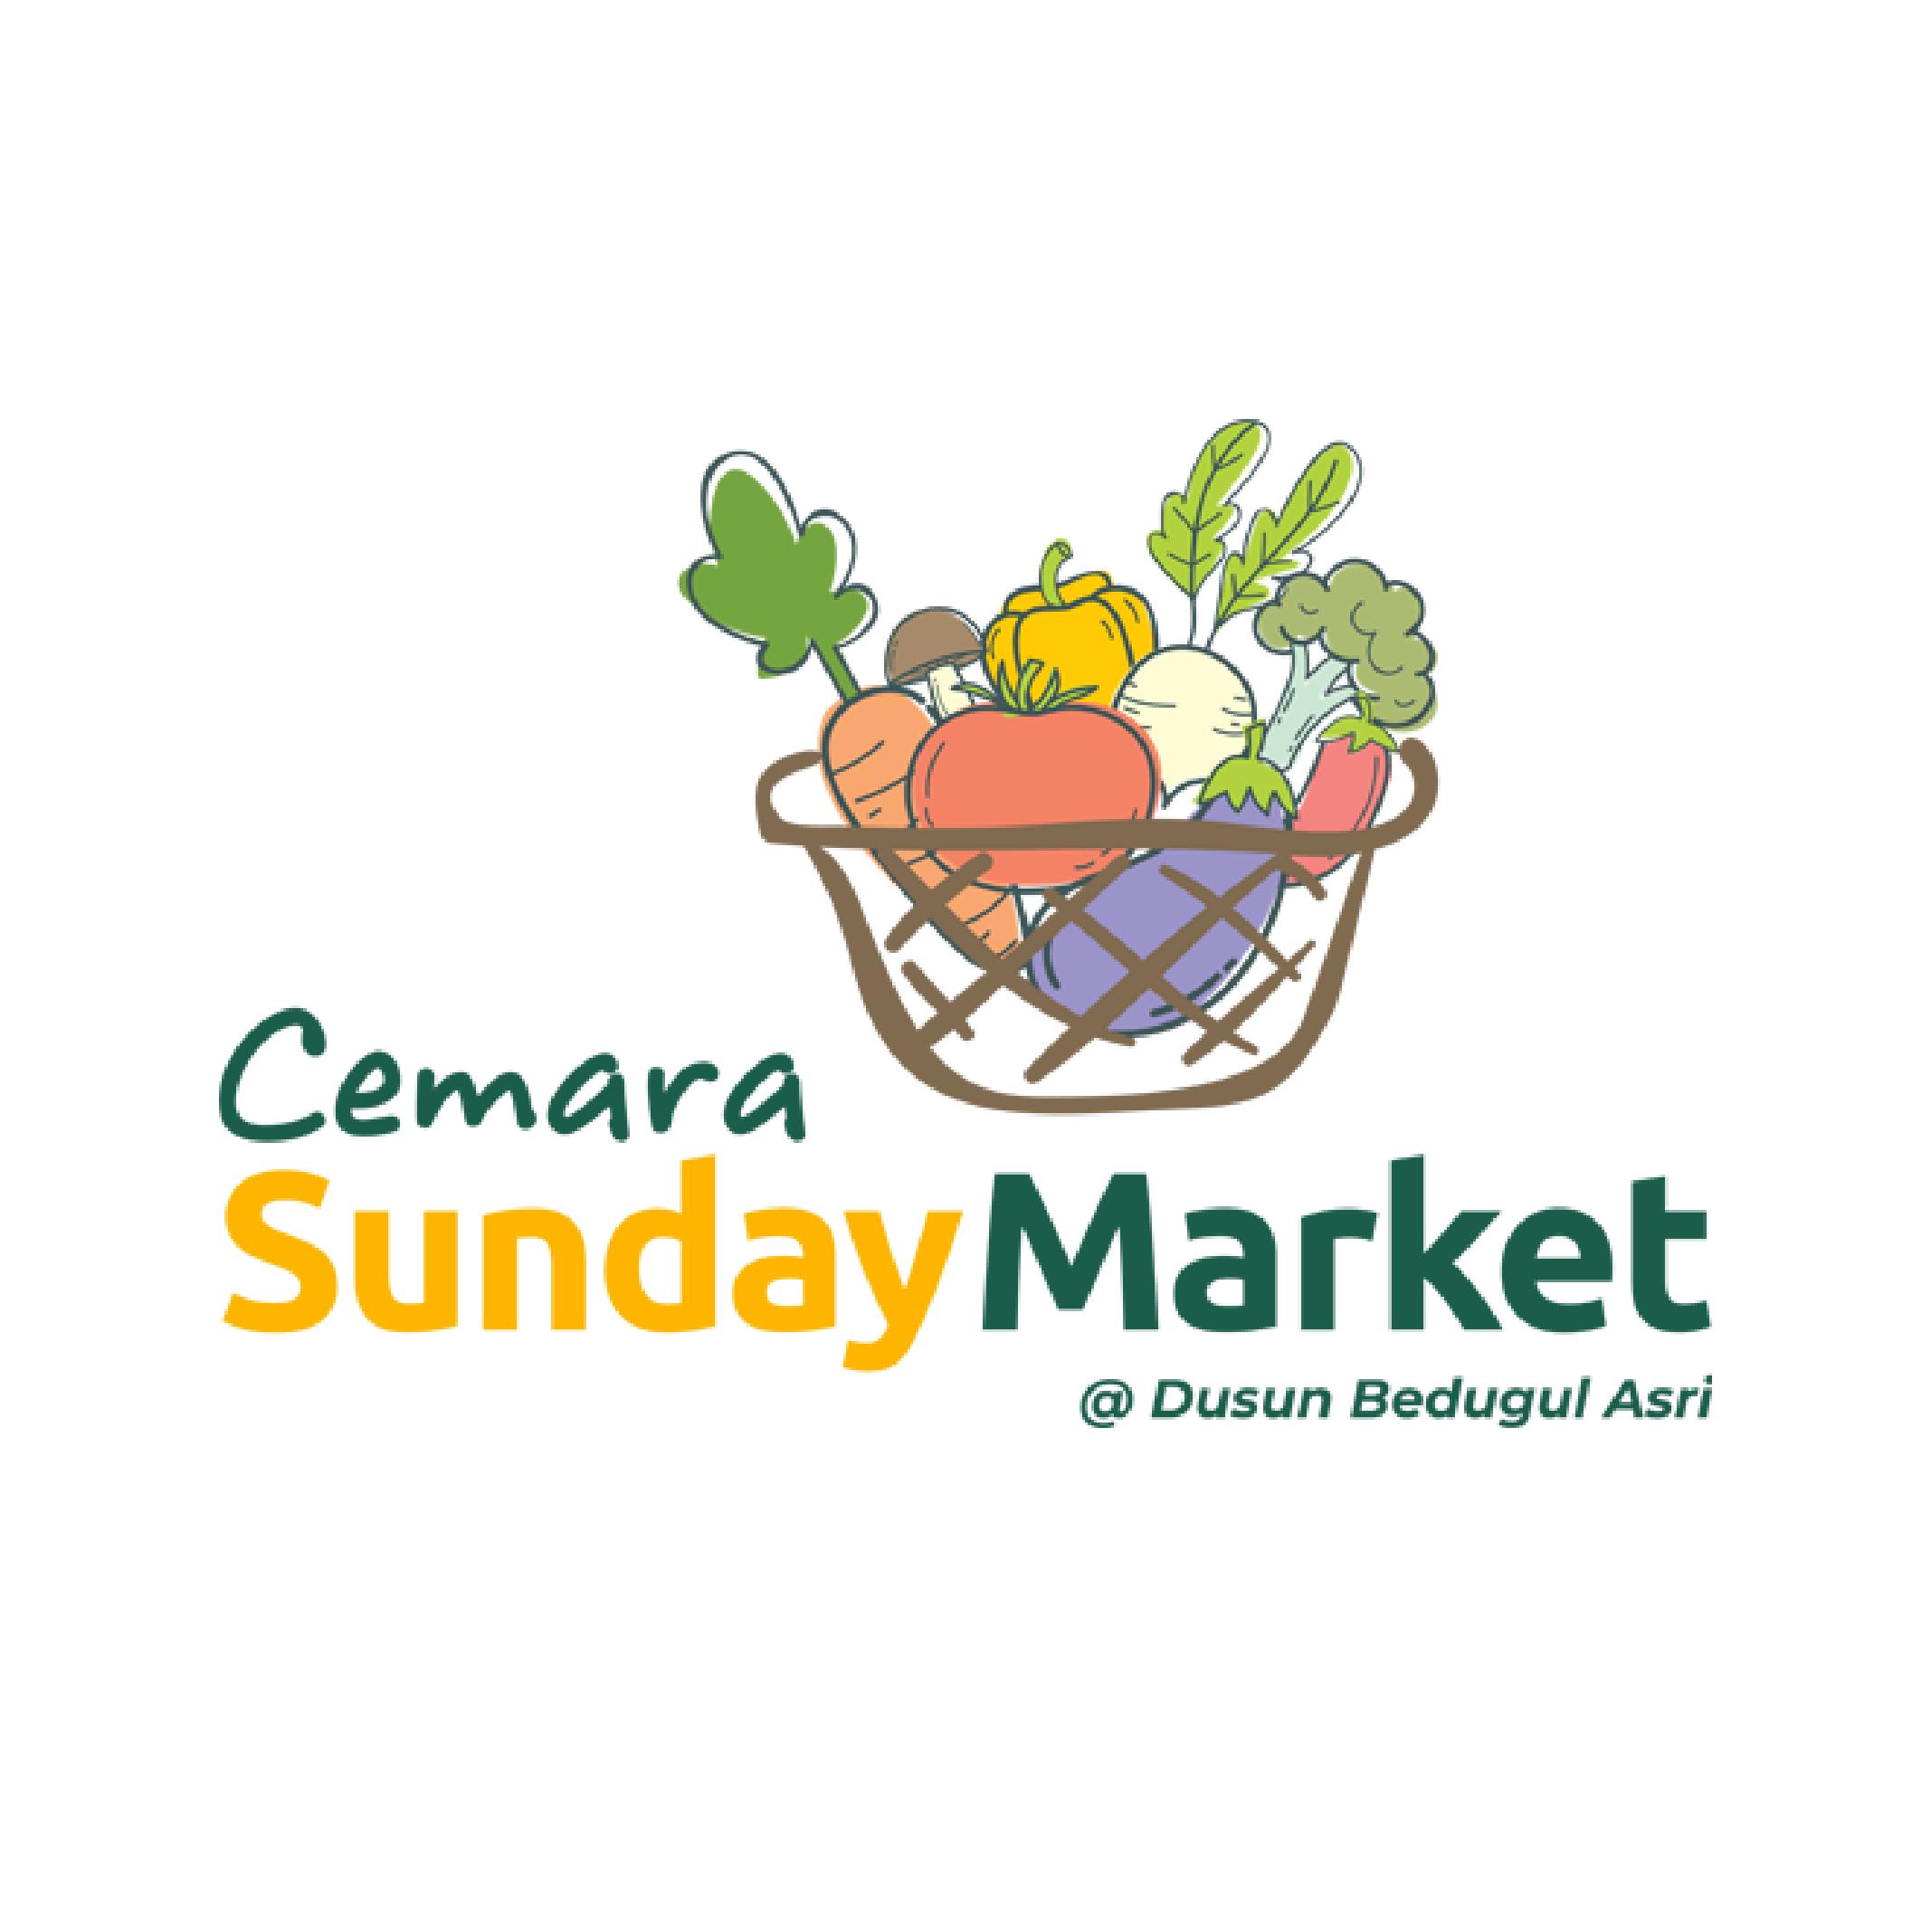 Cemara Sunday Market